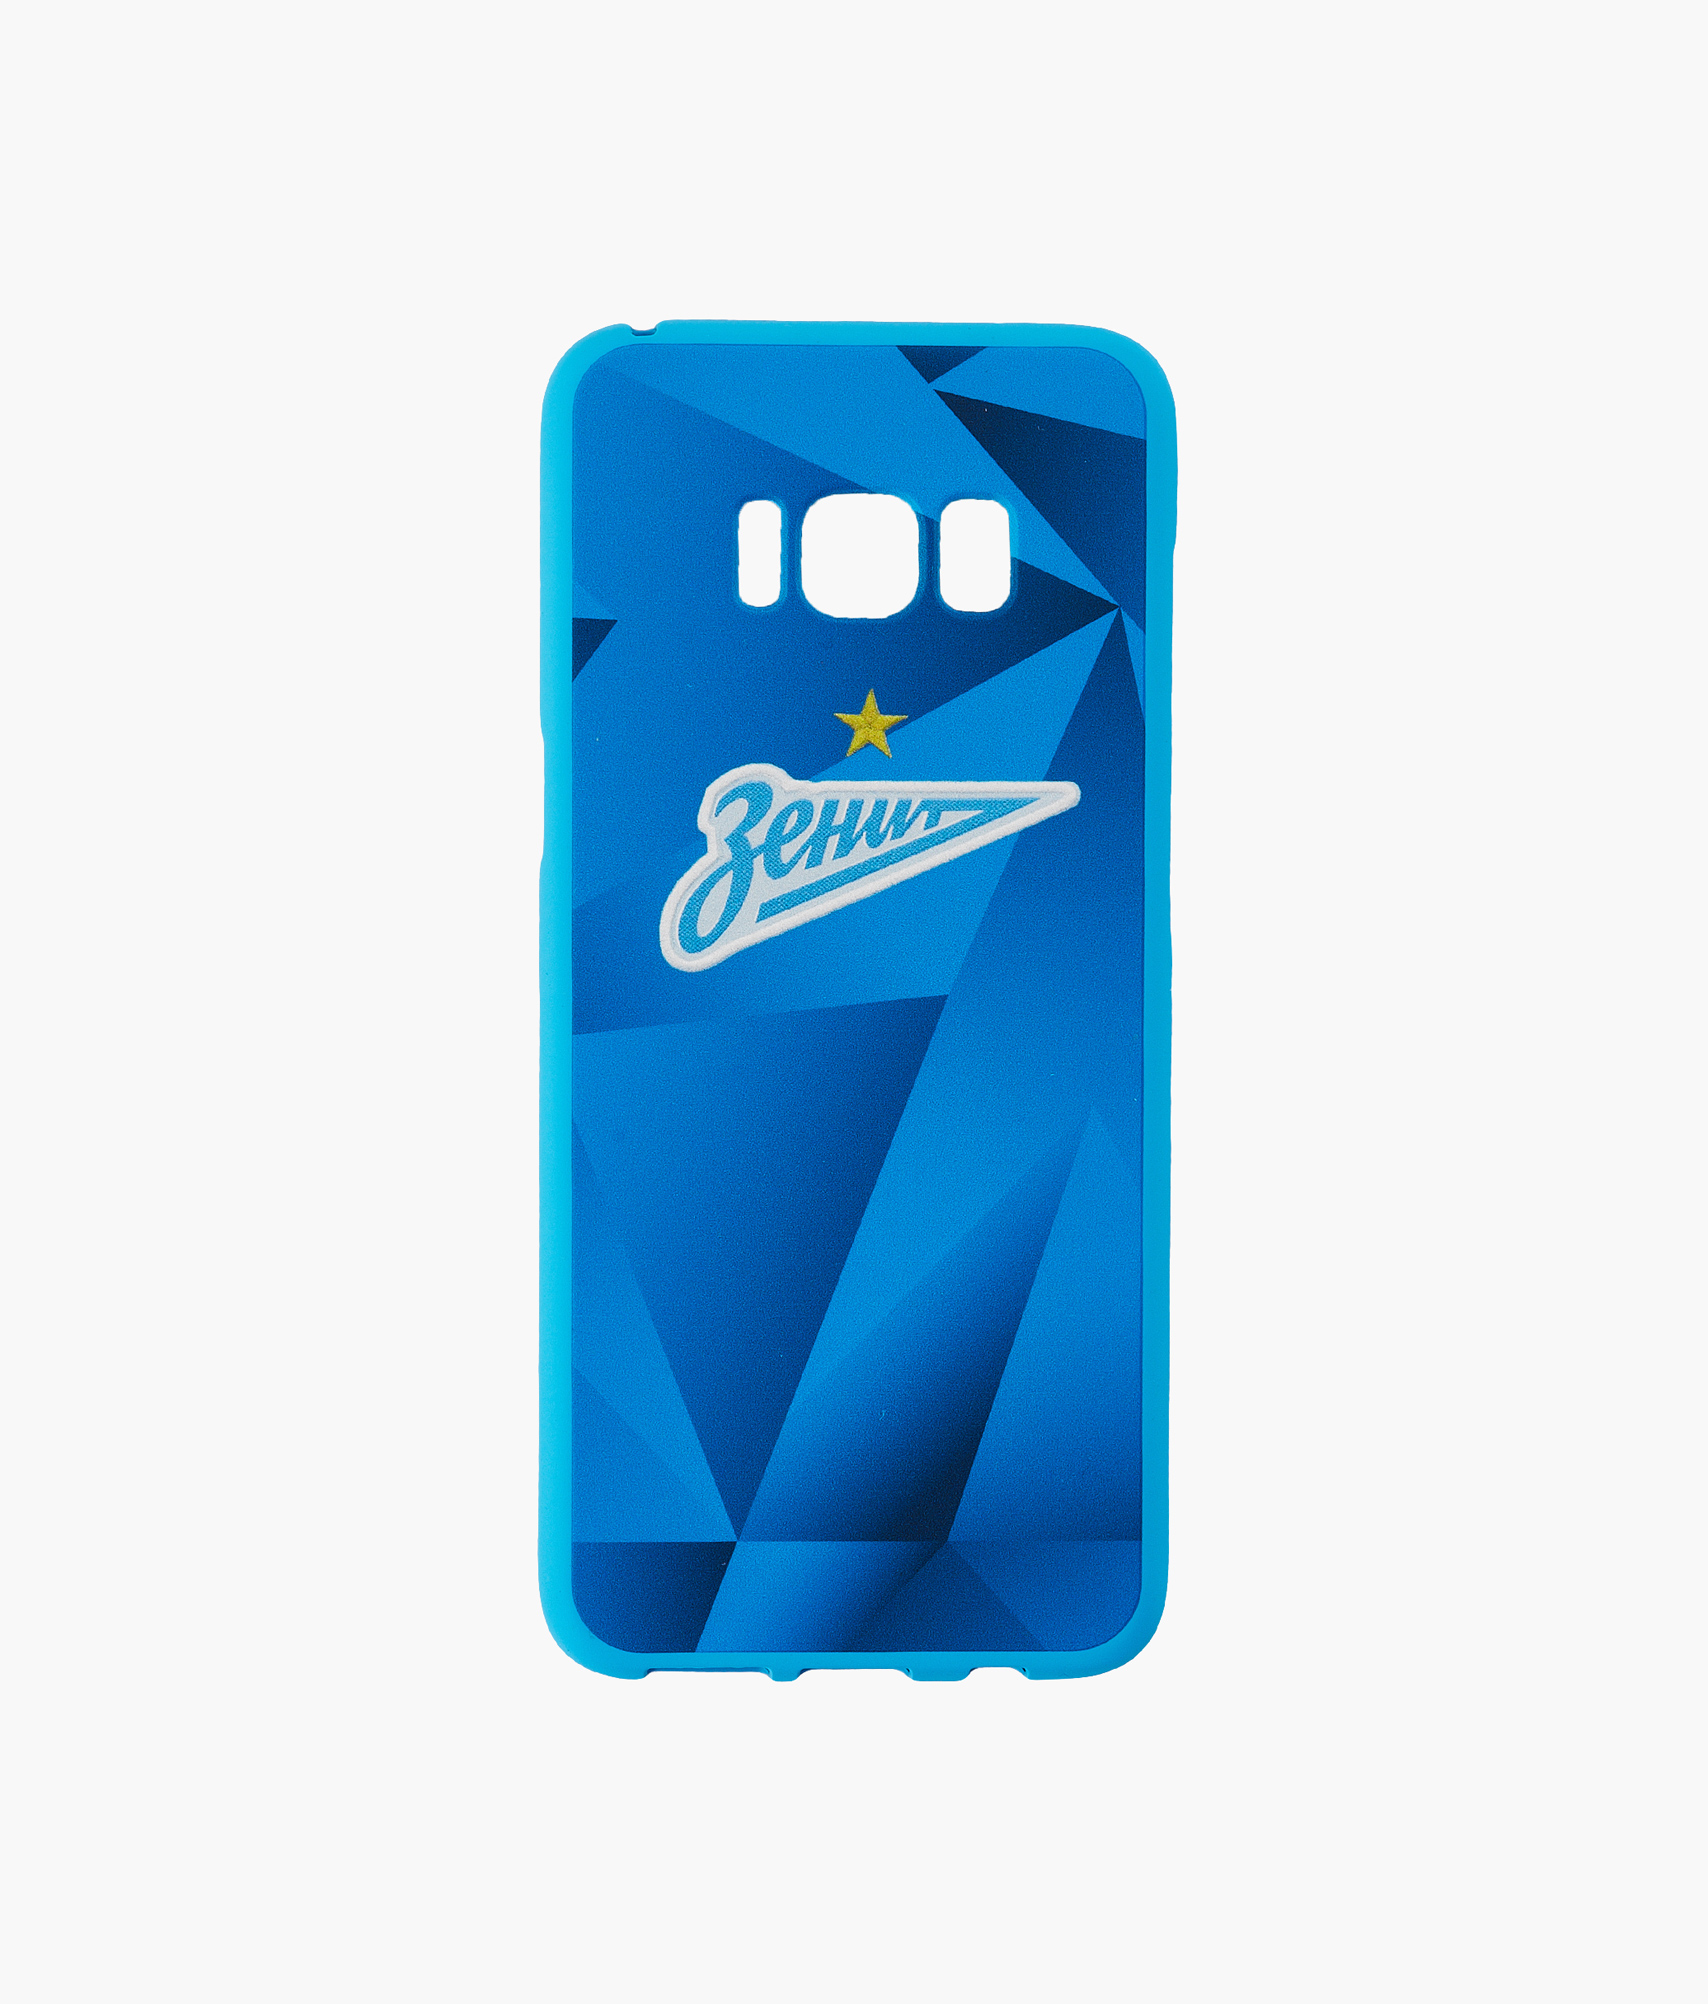 Фото - Чехол для Samsung Galaxy S8 «Форма 2019/20» Зенит Цвет-Синий аксессуар чехол neypo для samsung galaxy a10 2019 soft matte silicone dark blue nst11681